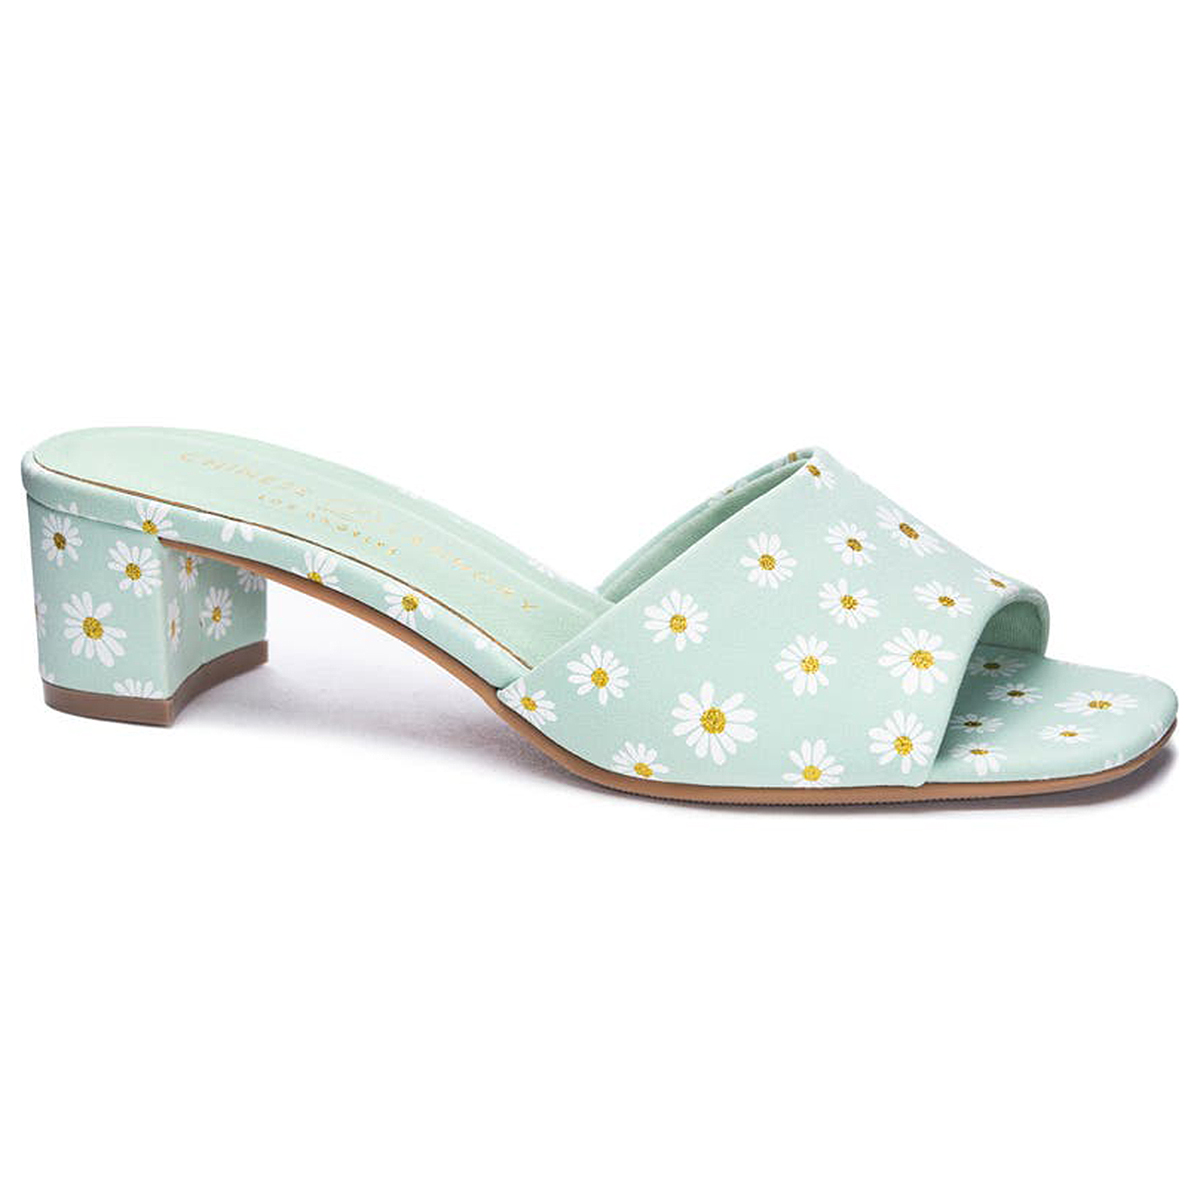 nordstrom-anniversary-sale-sandals